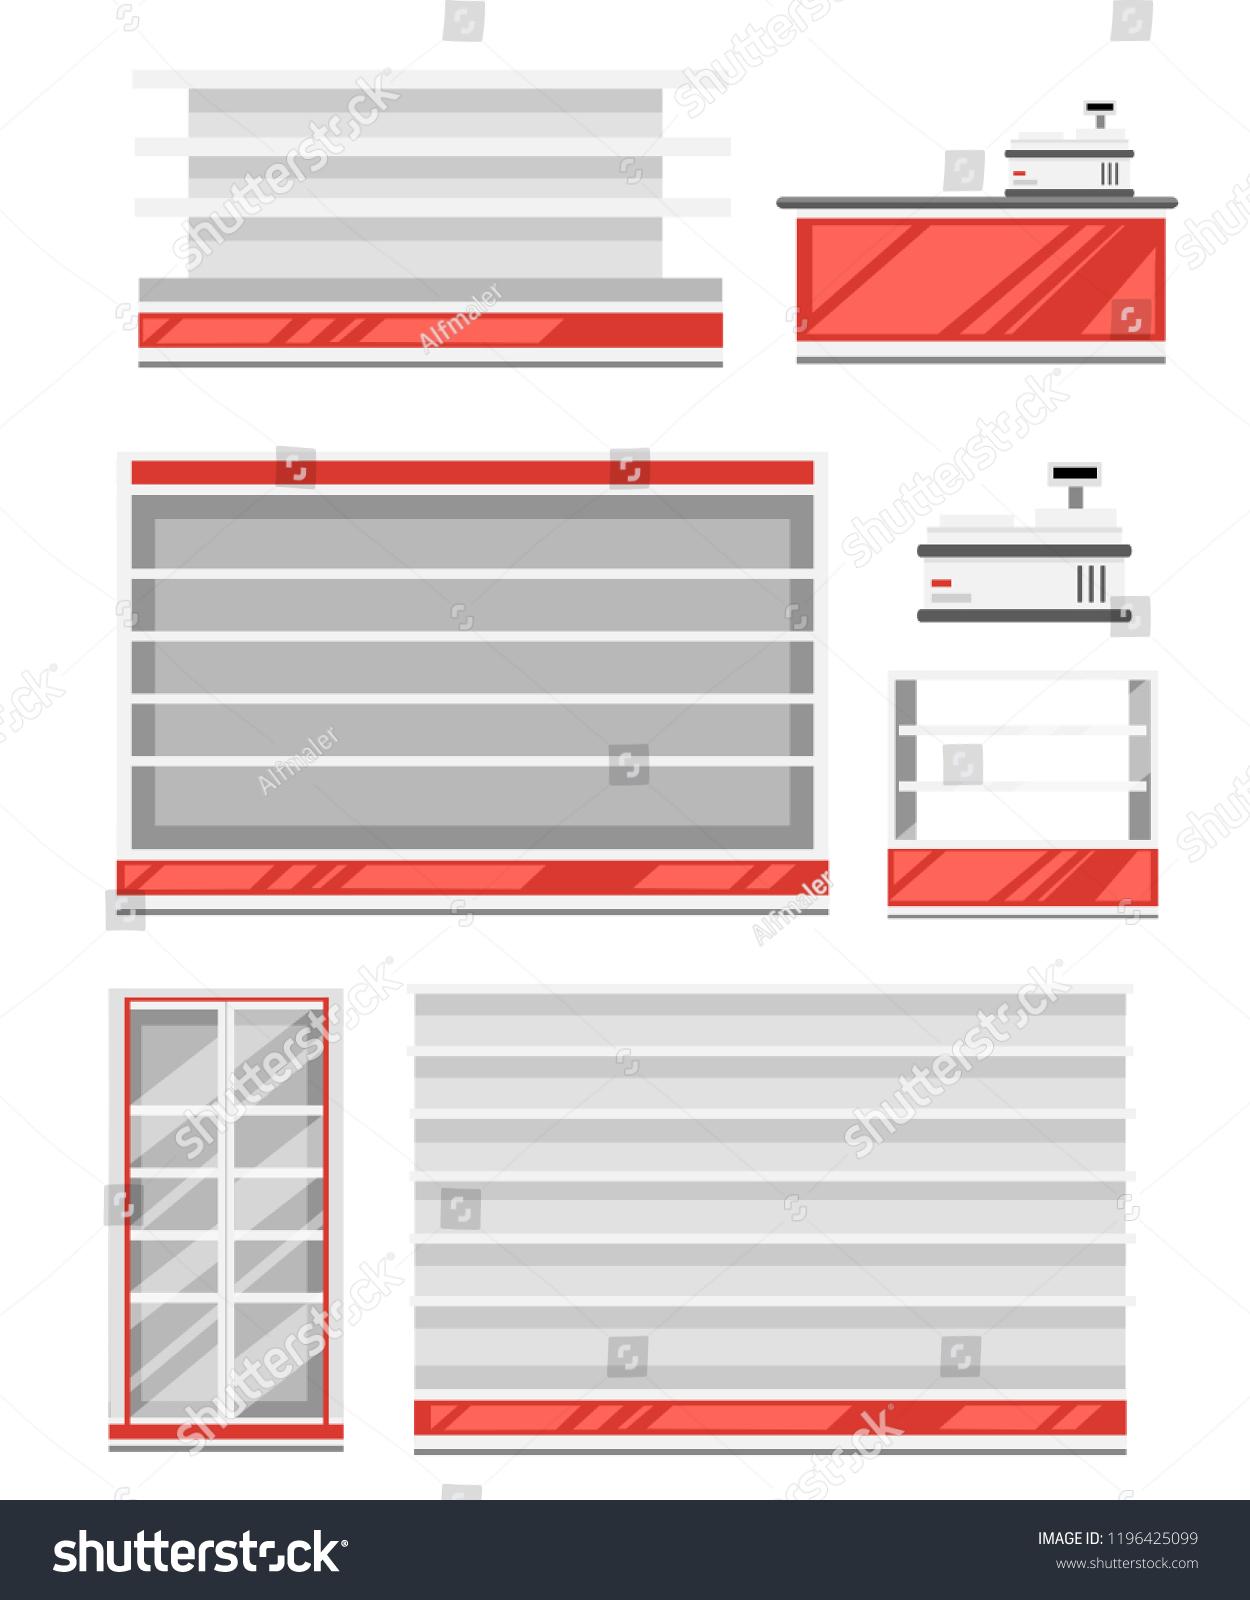 hight resolution of set of supermarket shelves red and white color shelf fridge and cash register